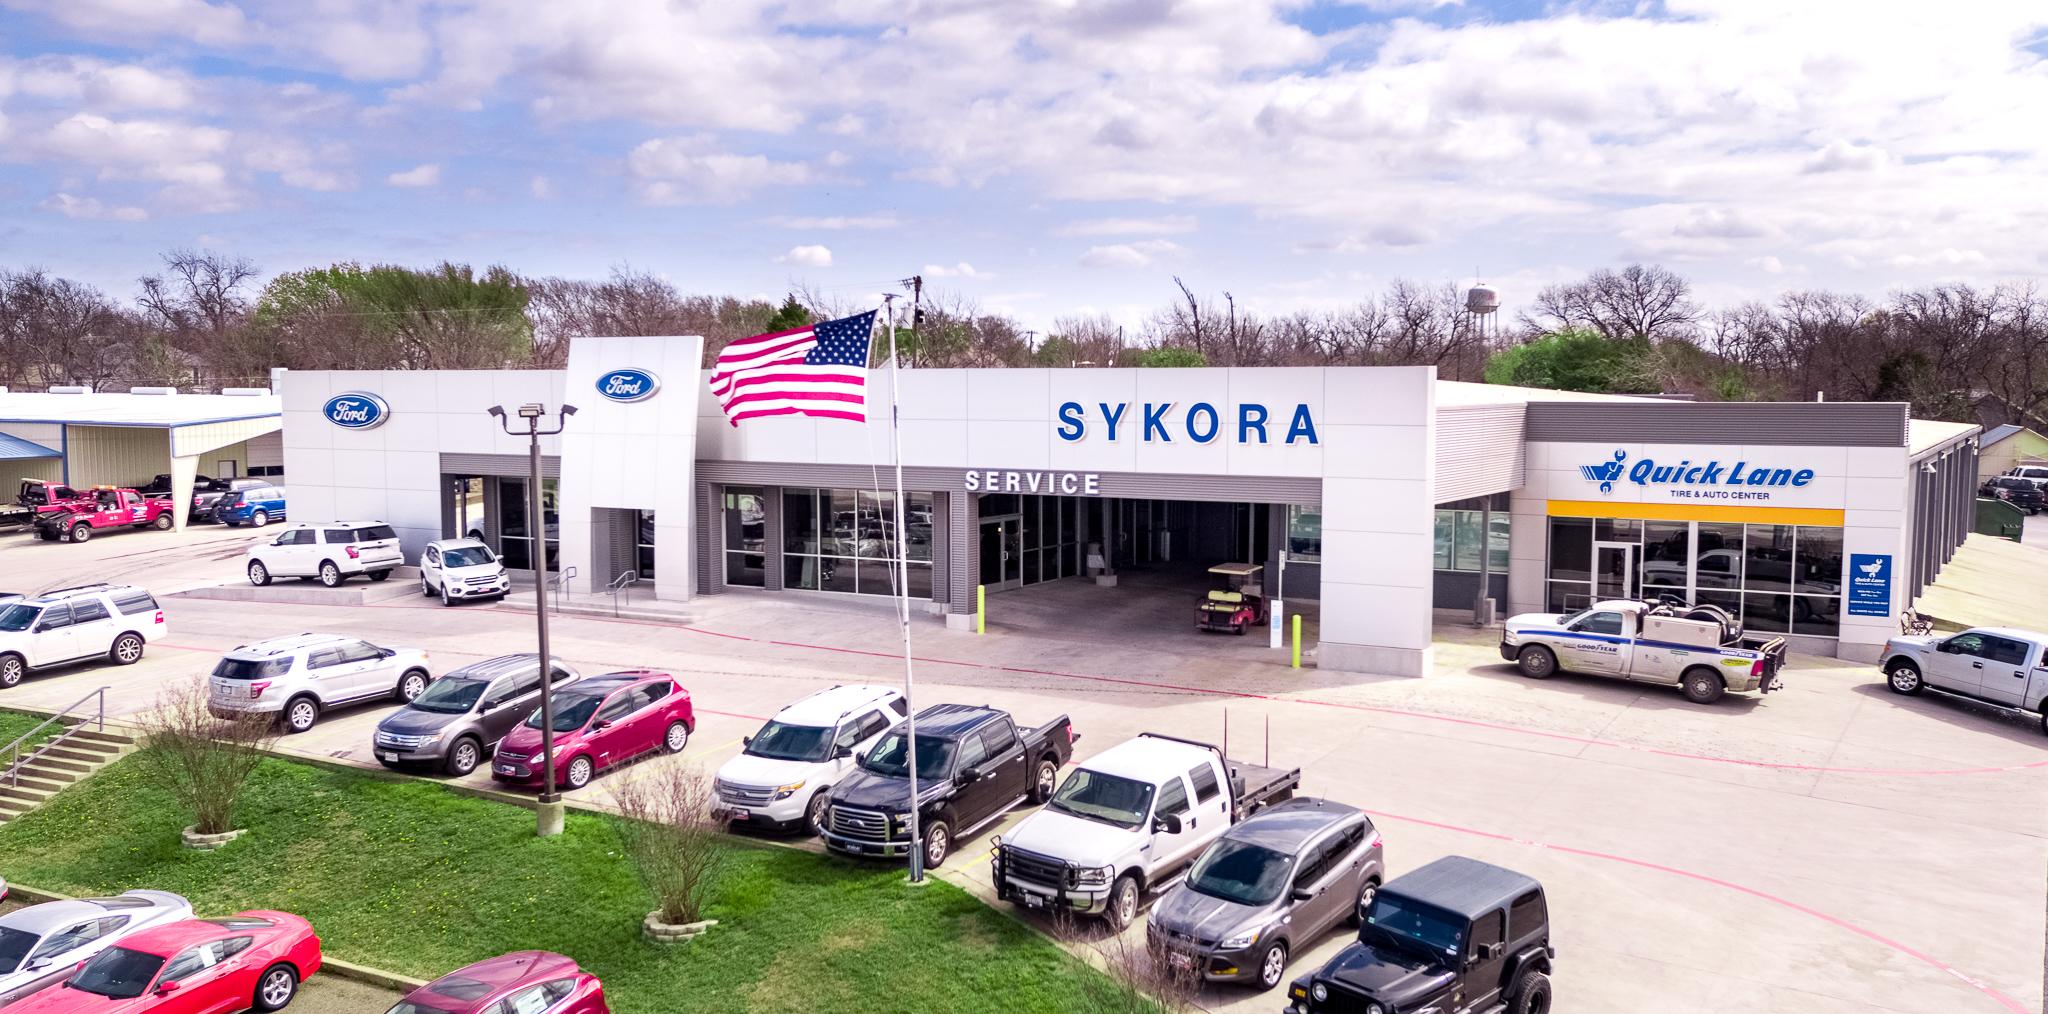 Sykora Ford  November 2016